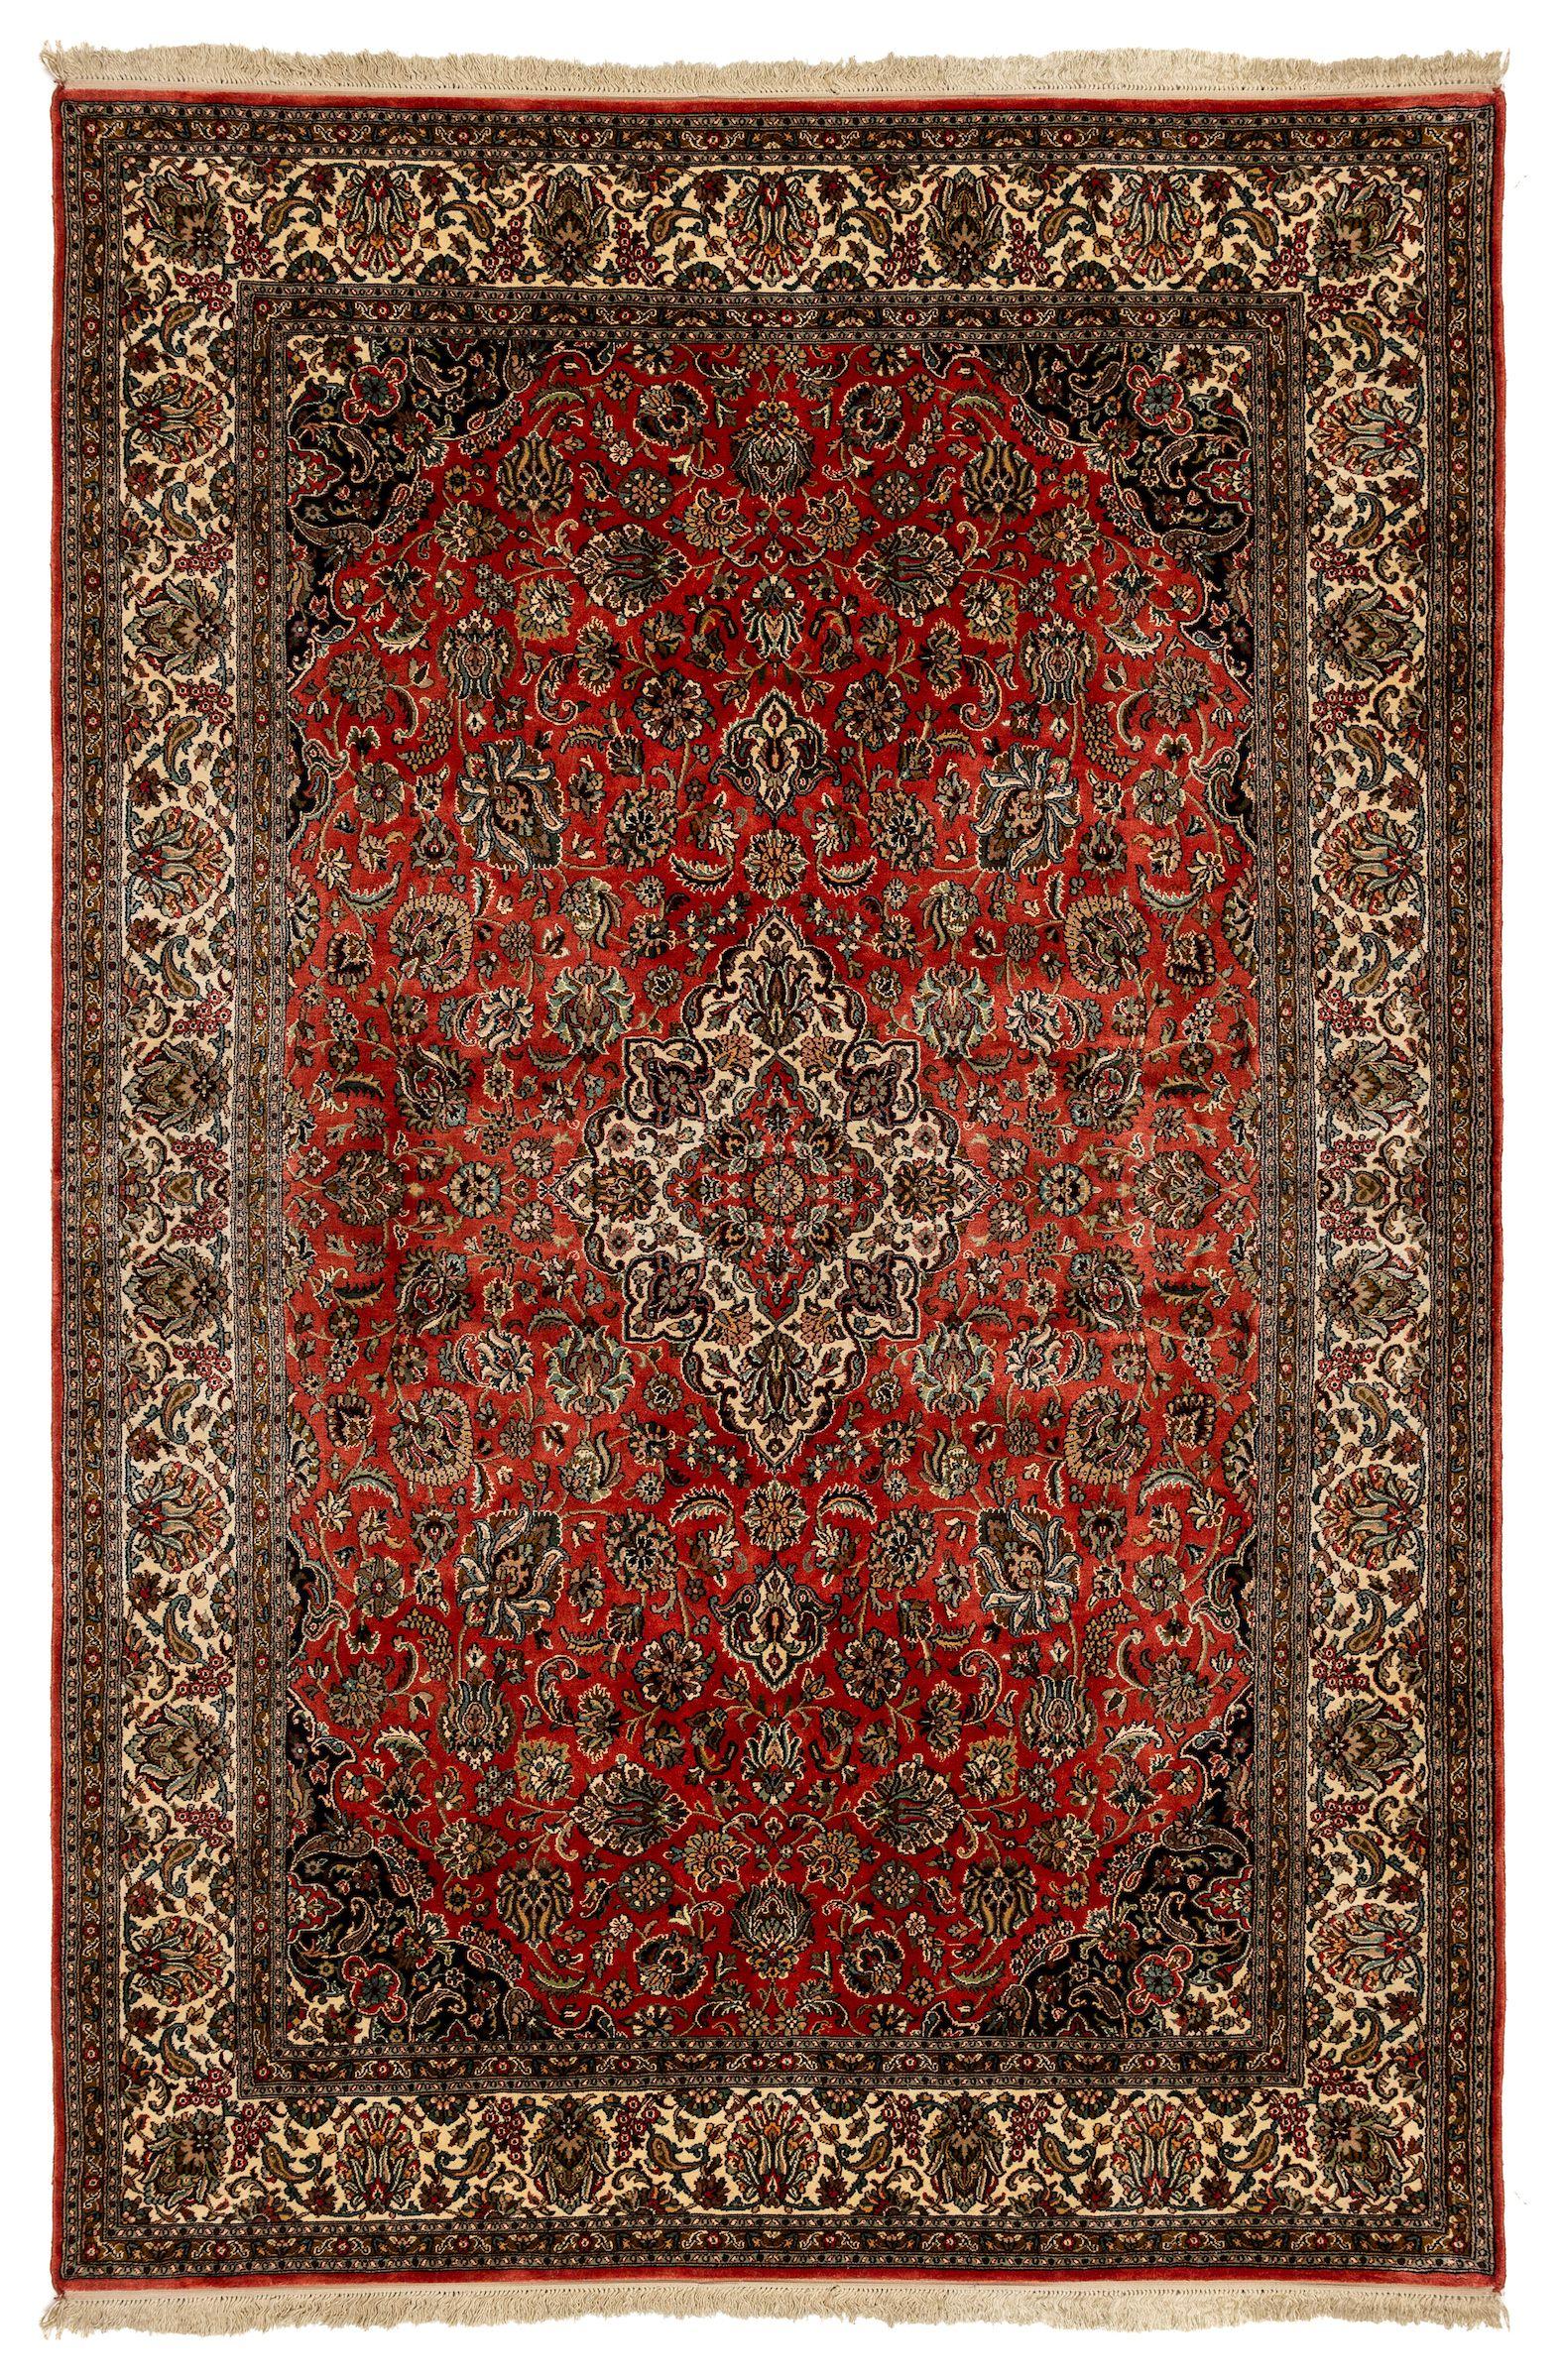 A Fine Kashmiri Double Arabesque Medallion Carpet On Deep Salmon Field Rugs Carpet Wood Lamp Design